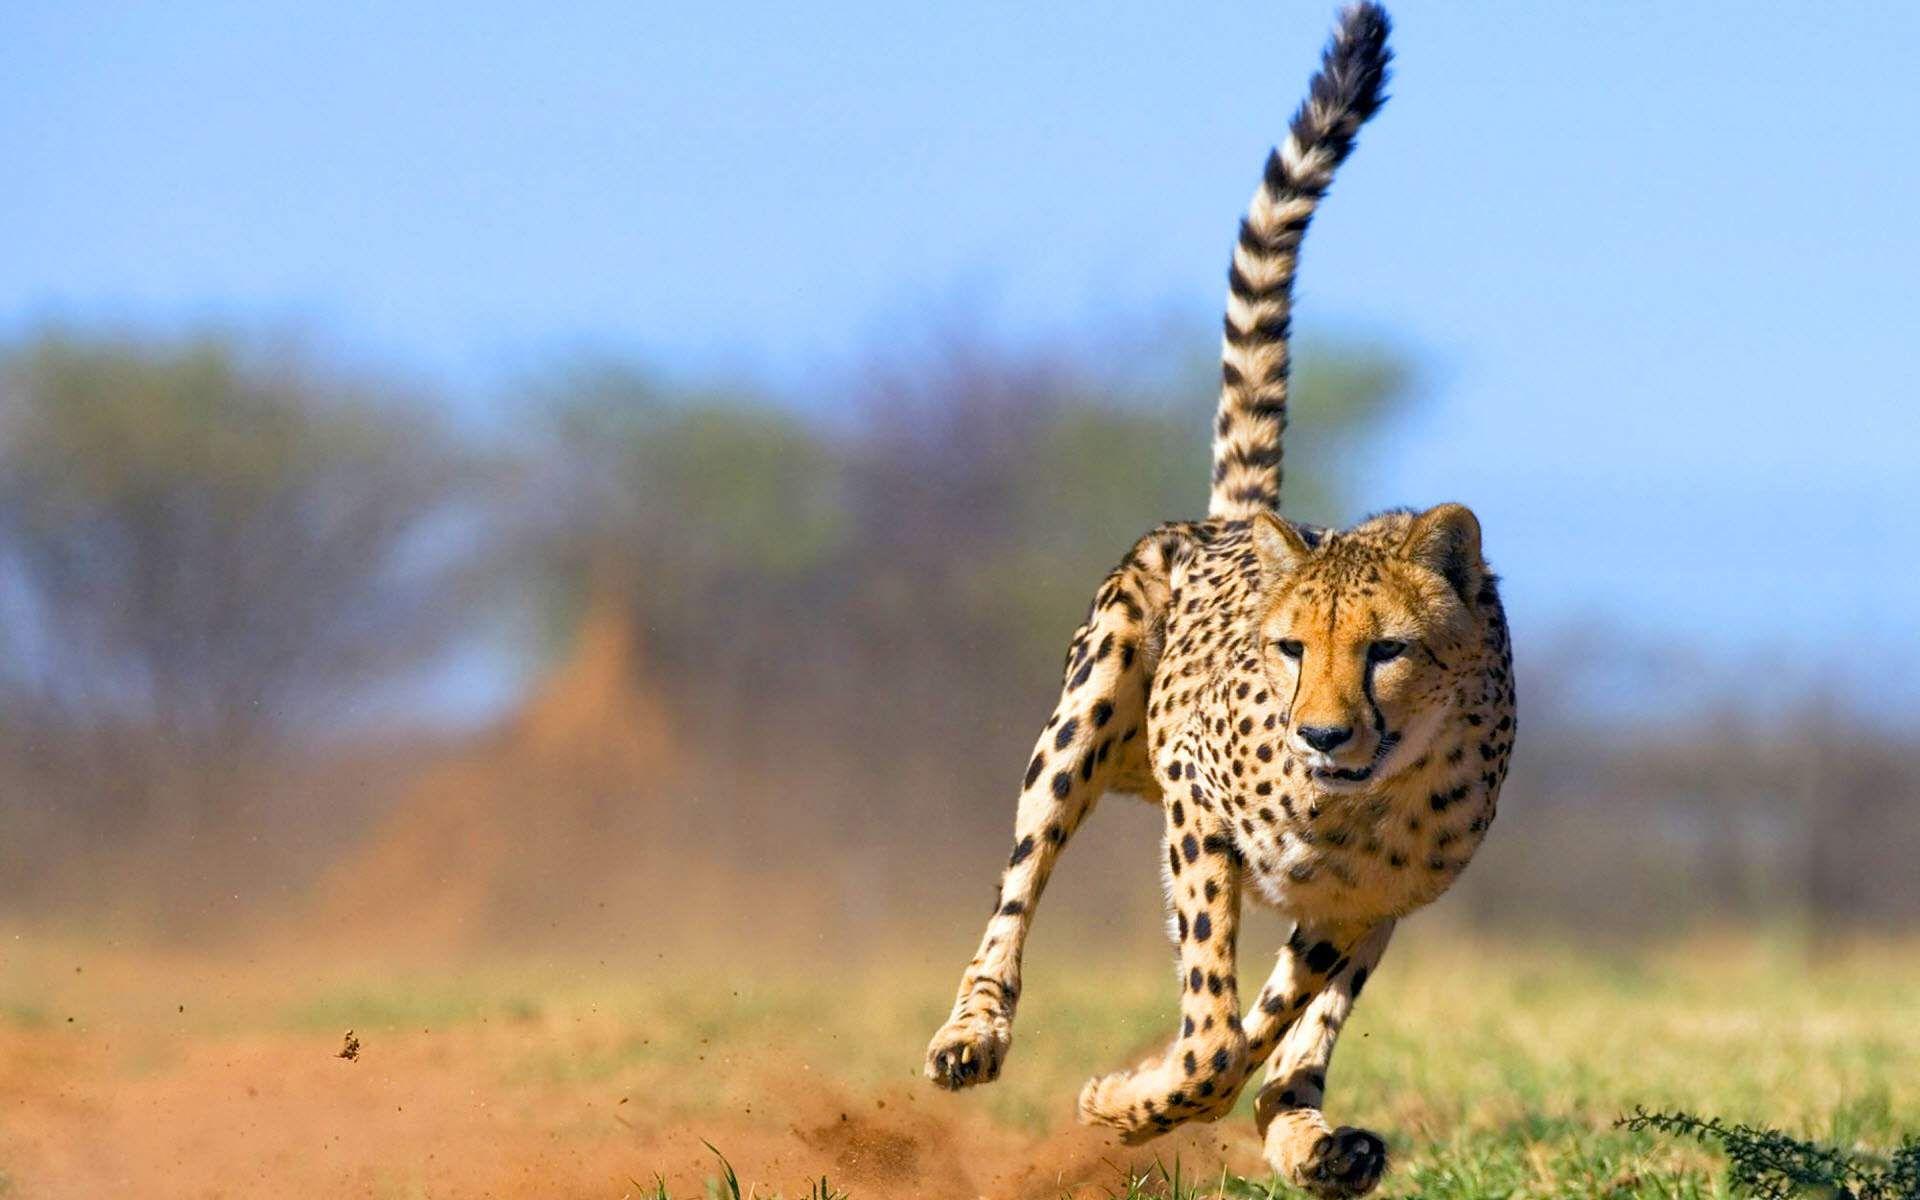 Cheetah Hd Free Wallpapers Cheetah Pictures Cheetah Animal